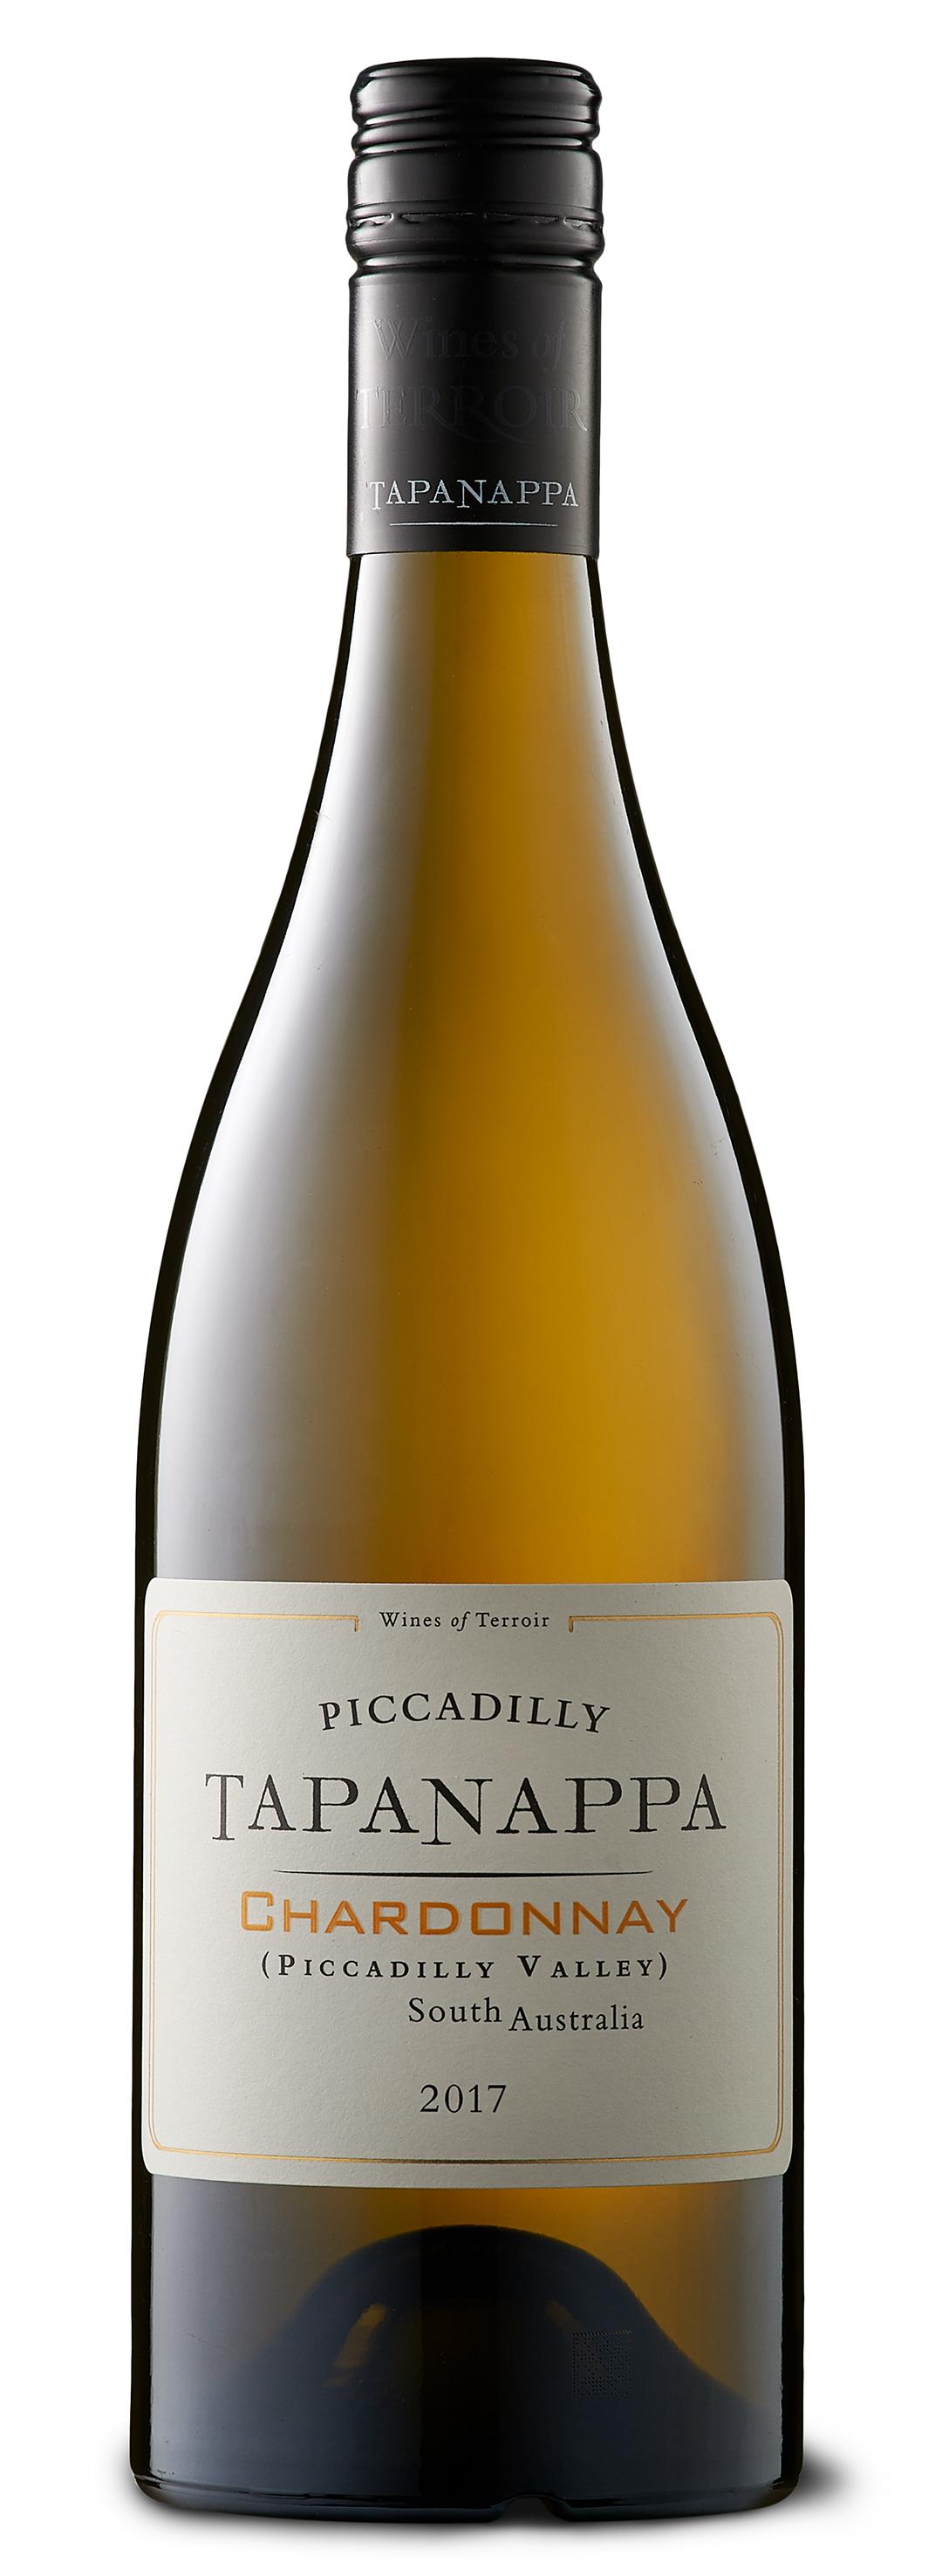 Tapanappa Piccadilly Valley 2017 Chardonnay